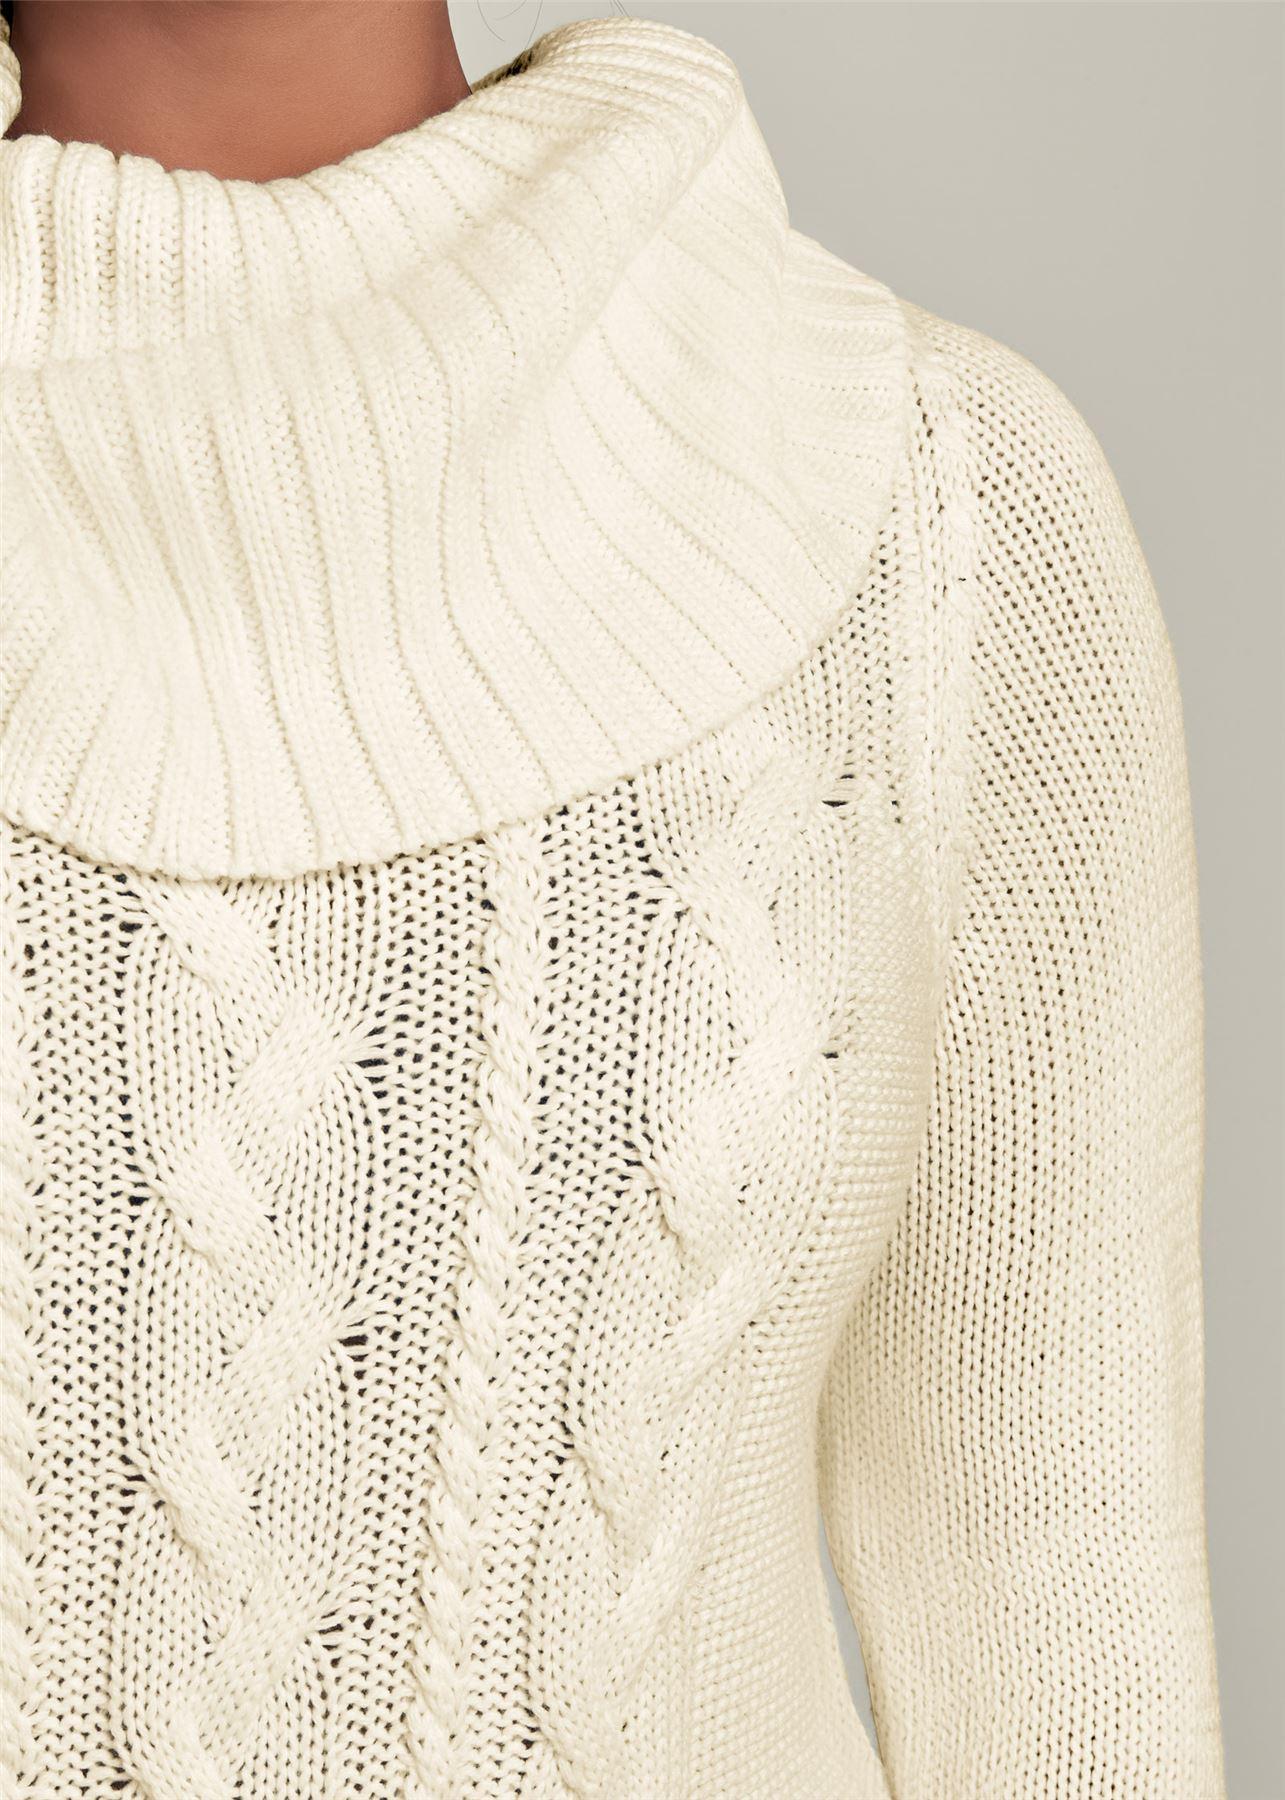 3XL VENUS Wide Roll Neck Warm Chunky Cable Knit Jumper Dress Size XS